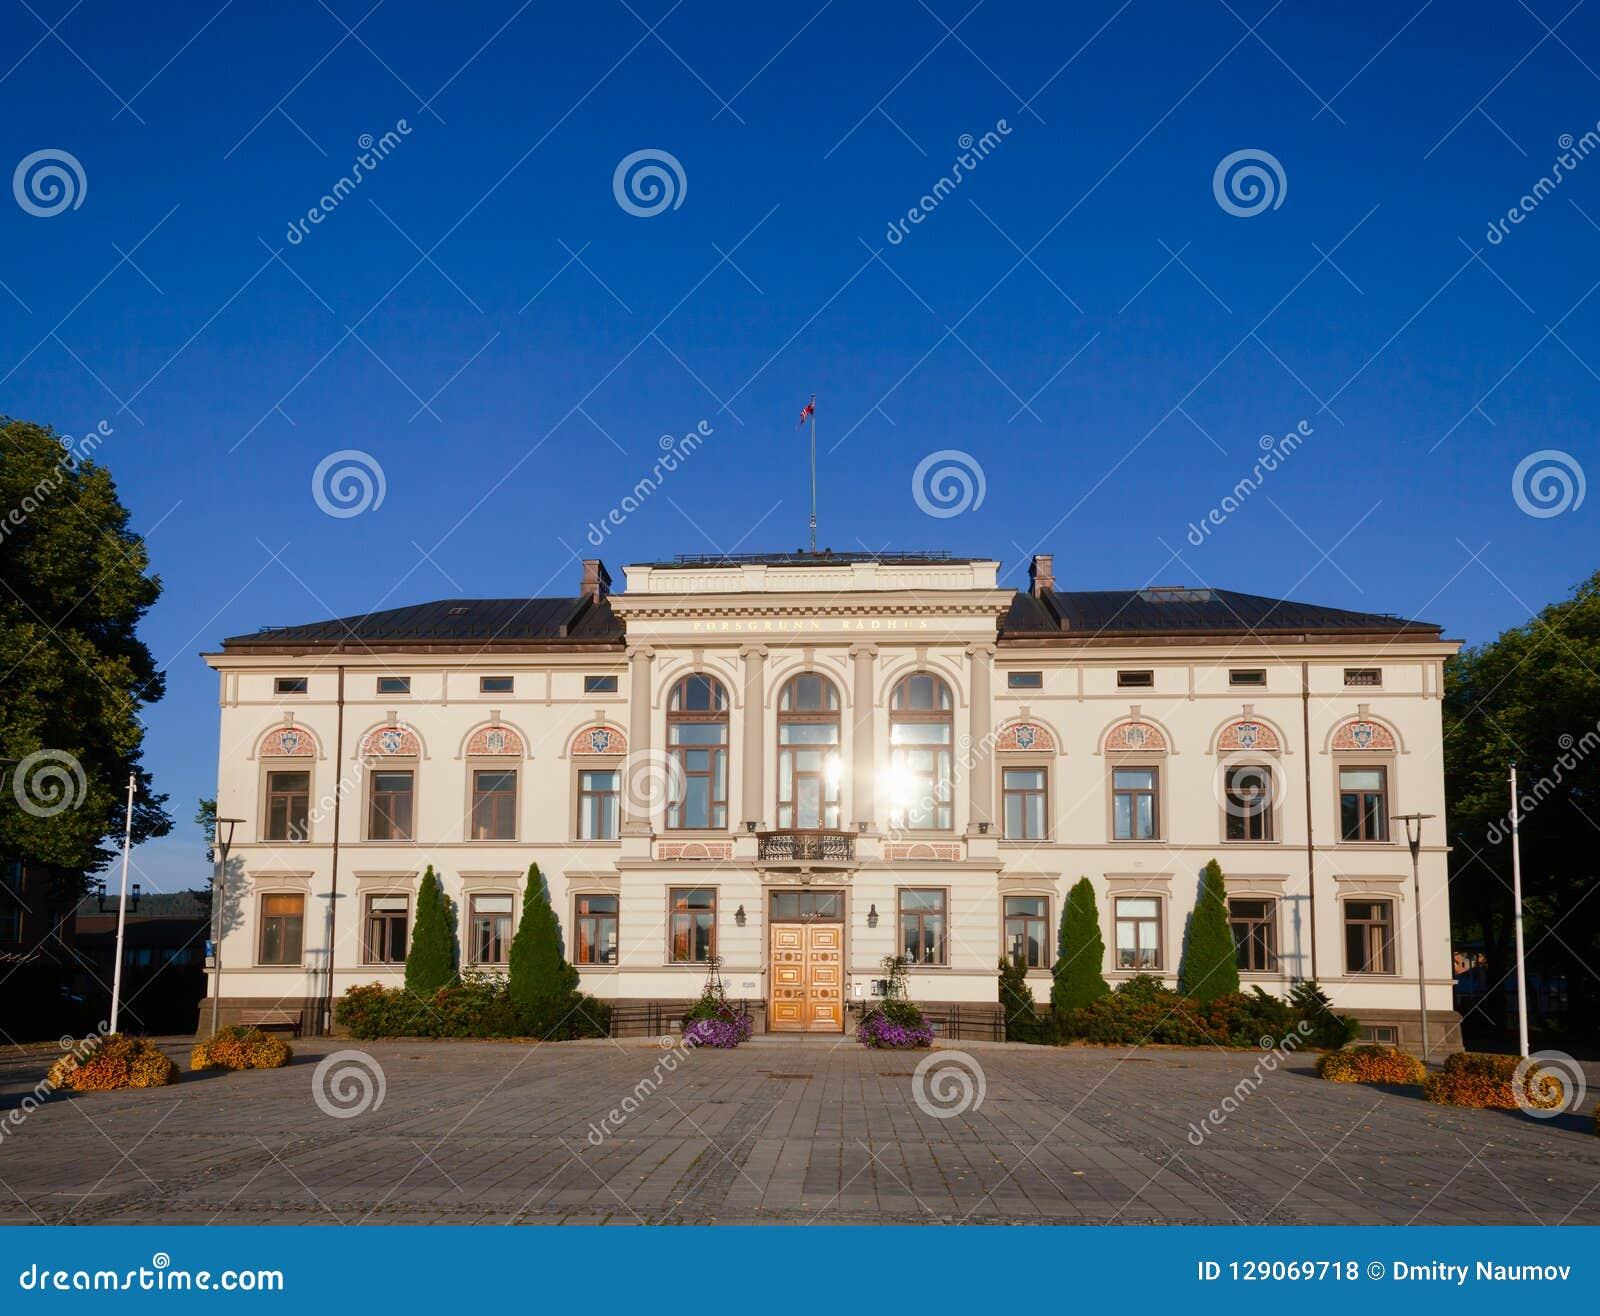 Ville Hall Telemark Norway Scandinavia de Porsgrunn